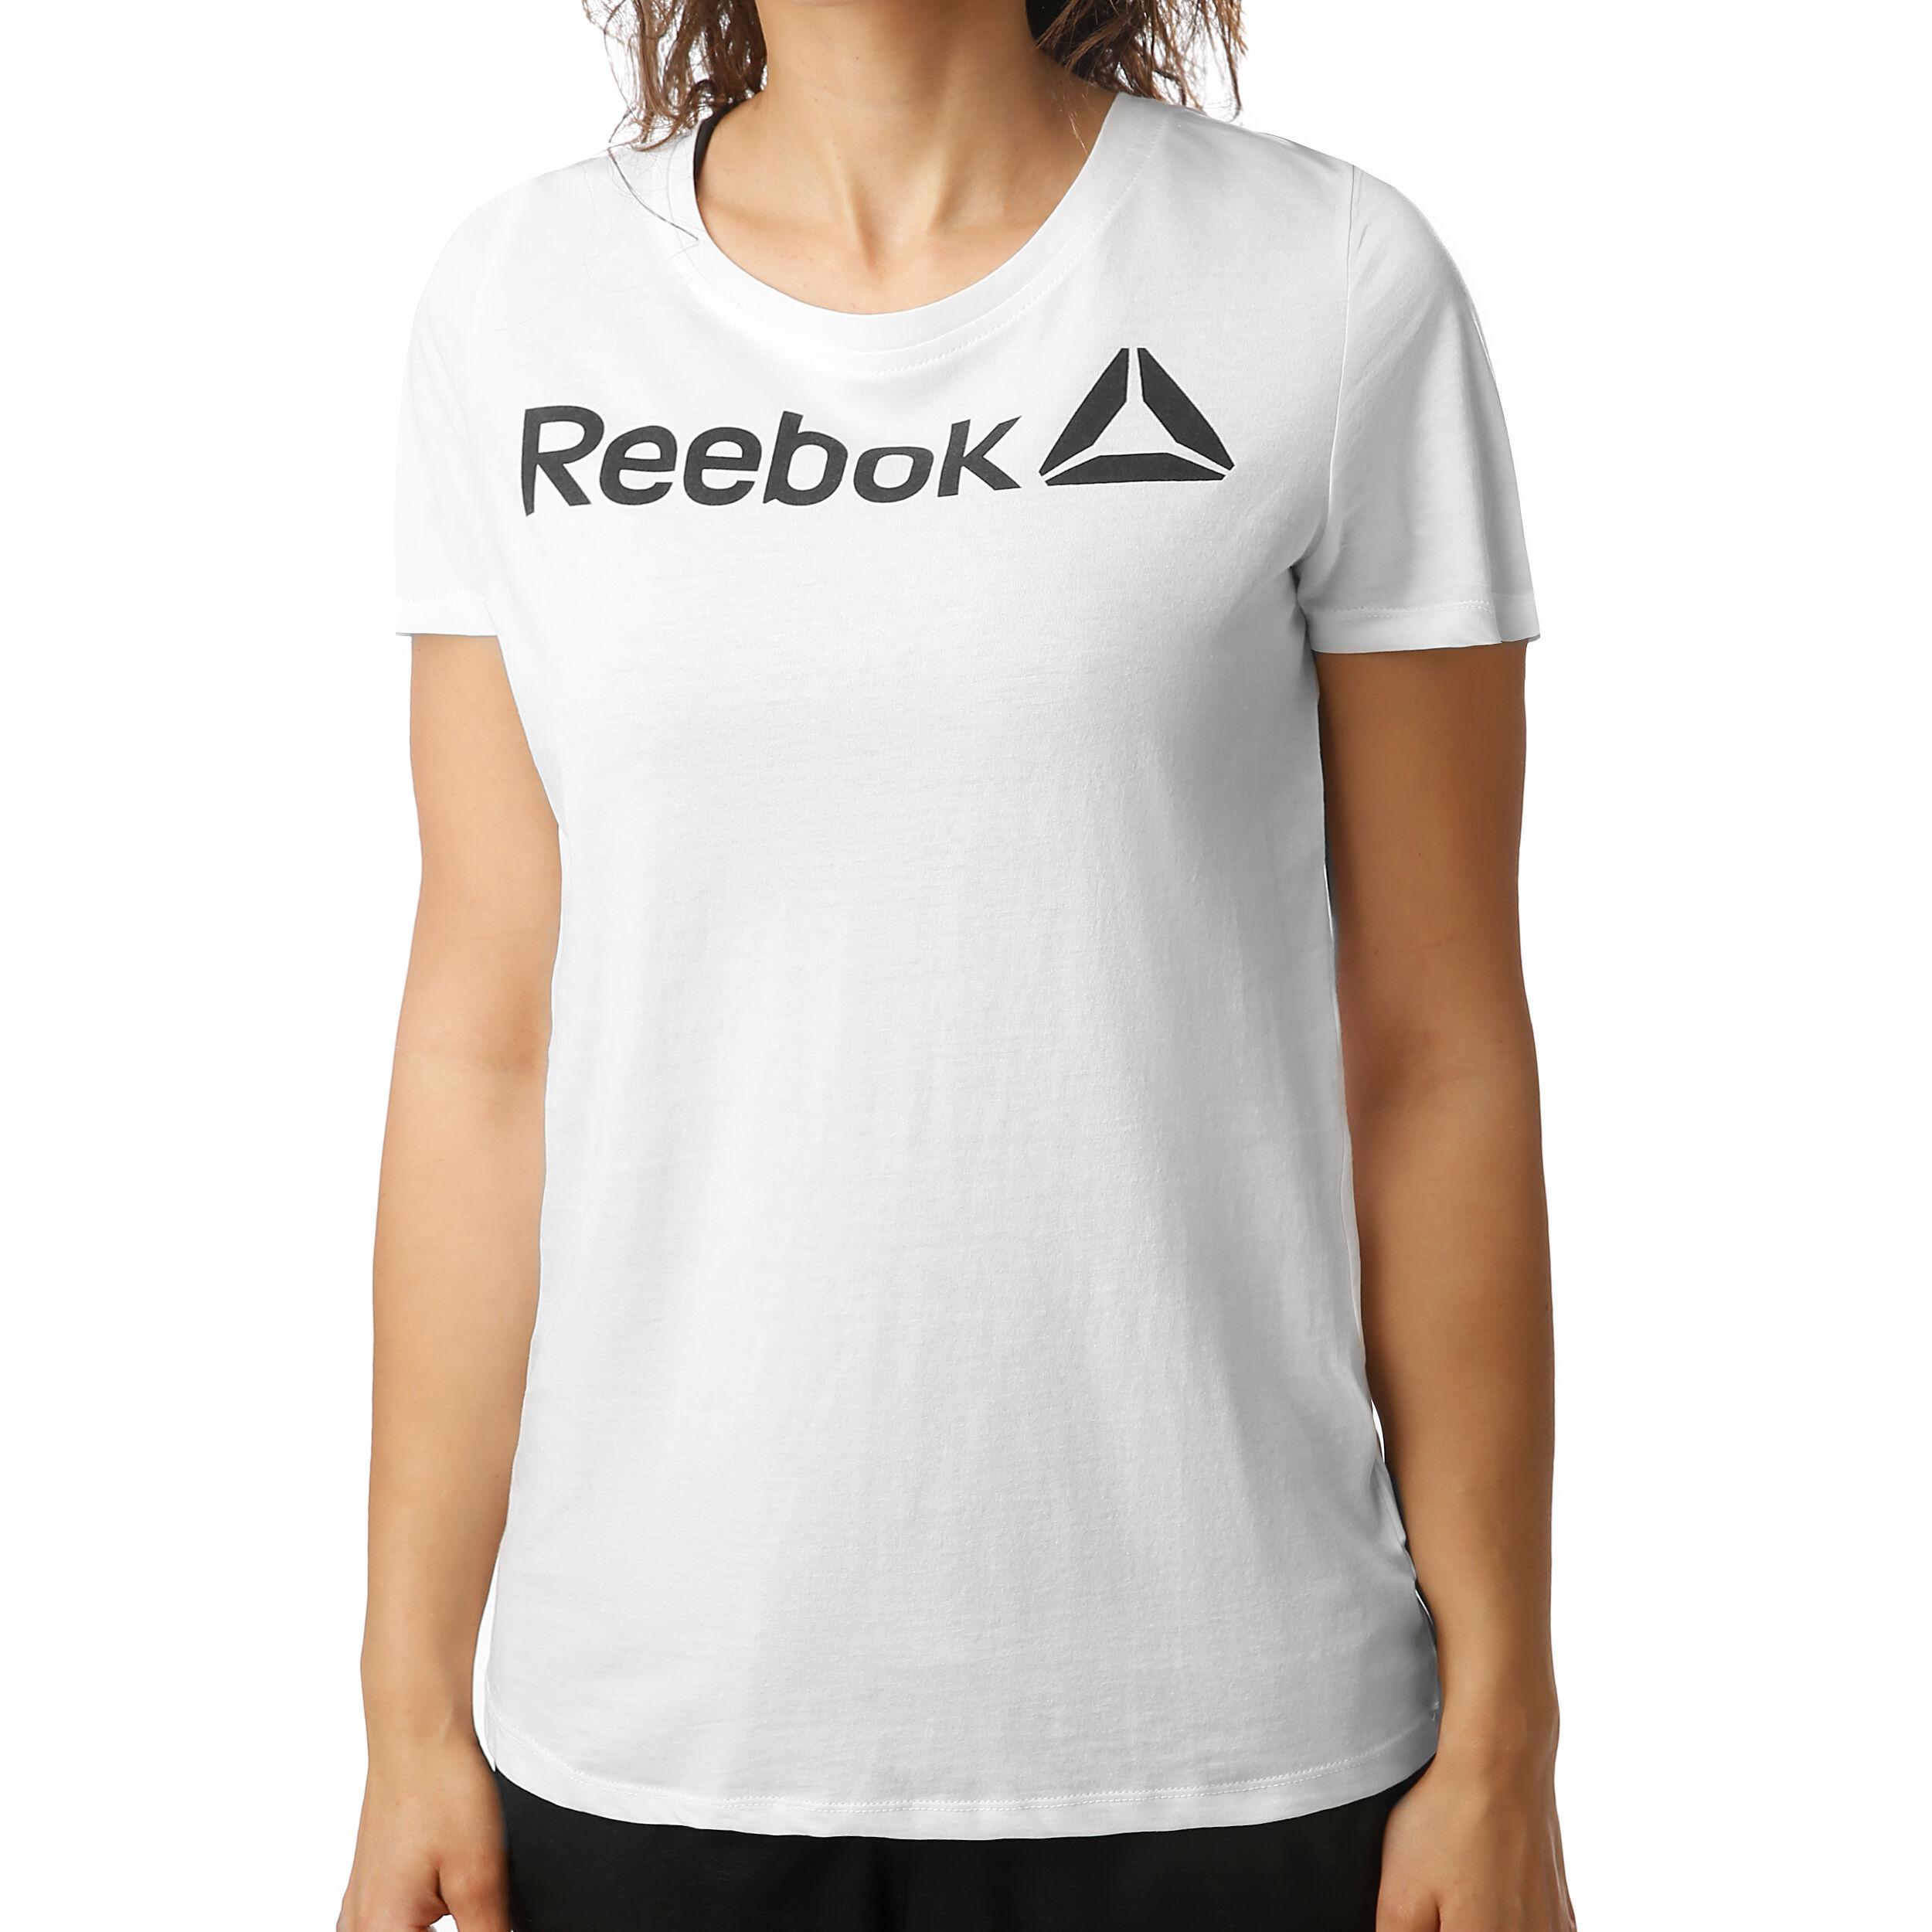 reebok online cheap shoes, Reebok Scoop Neck Tee White